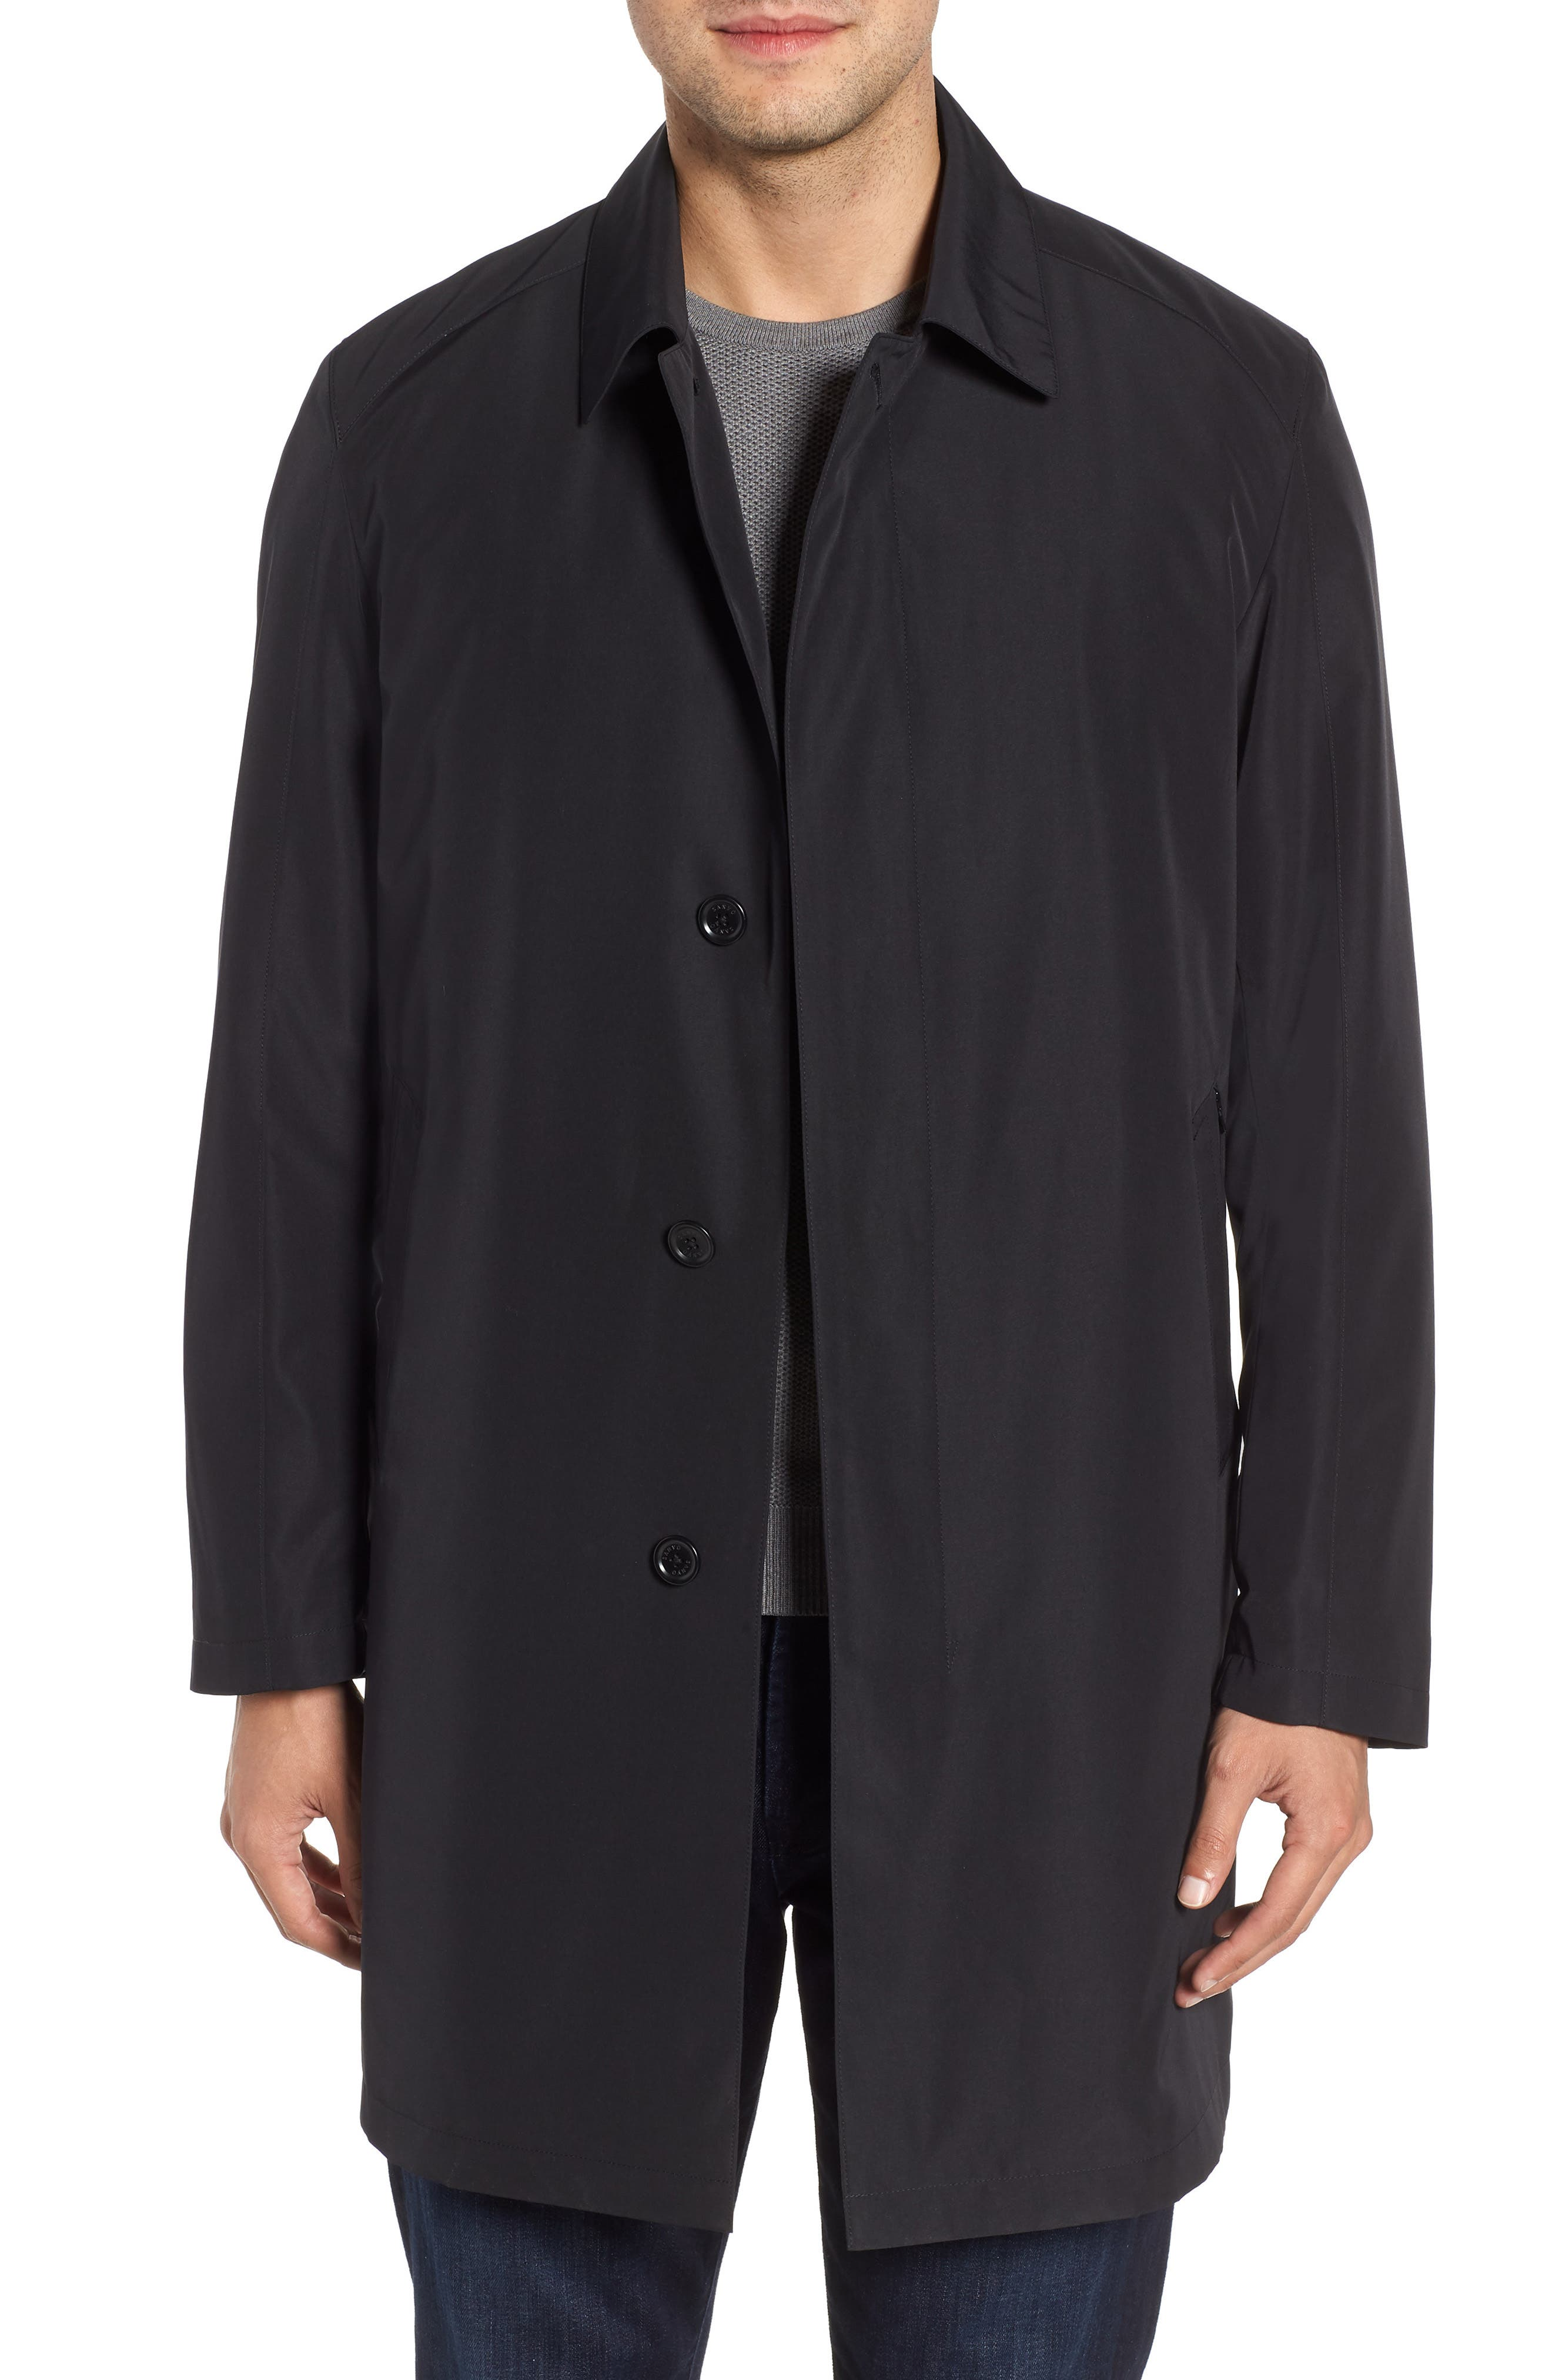 Ducasse Raincoat,                         Main,                         color, BLACK